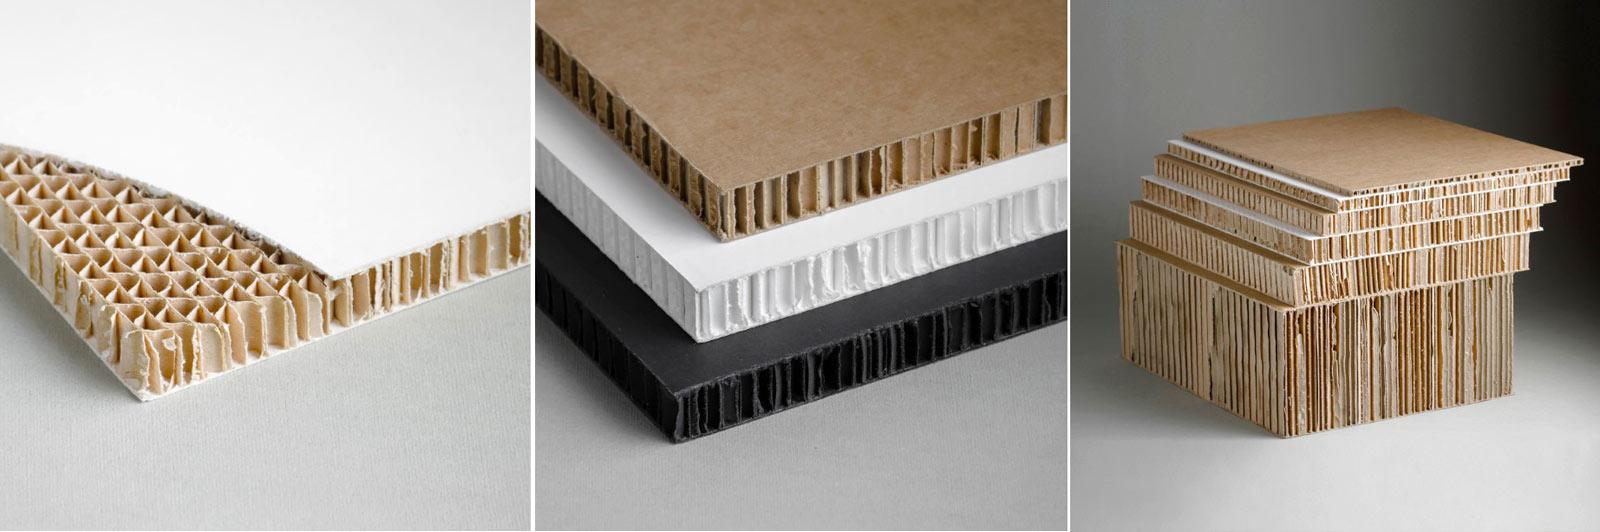 buigiordano carton cardboard